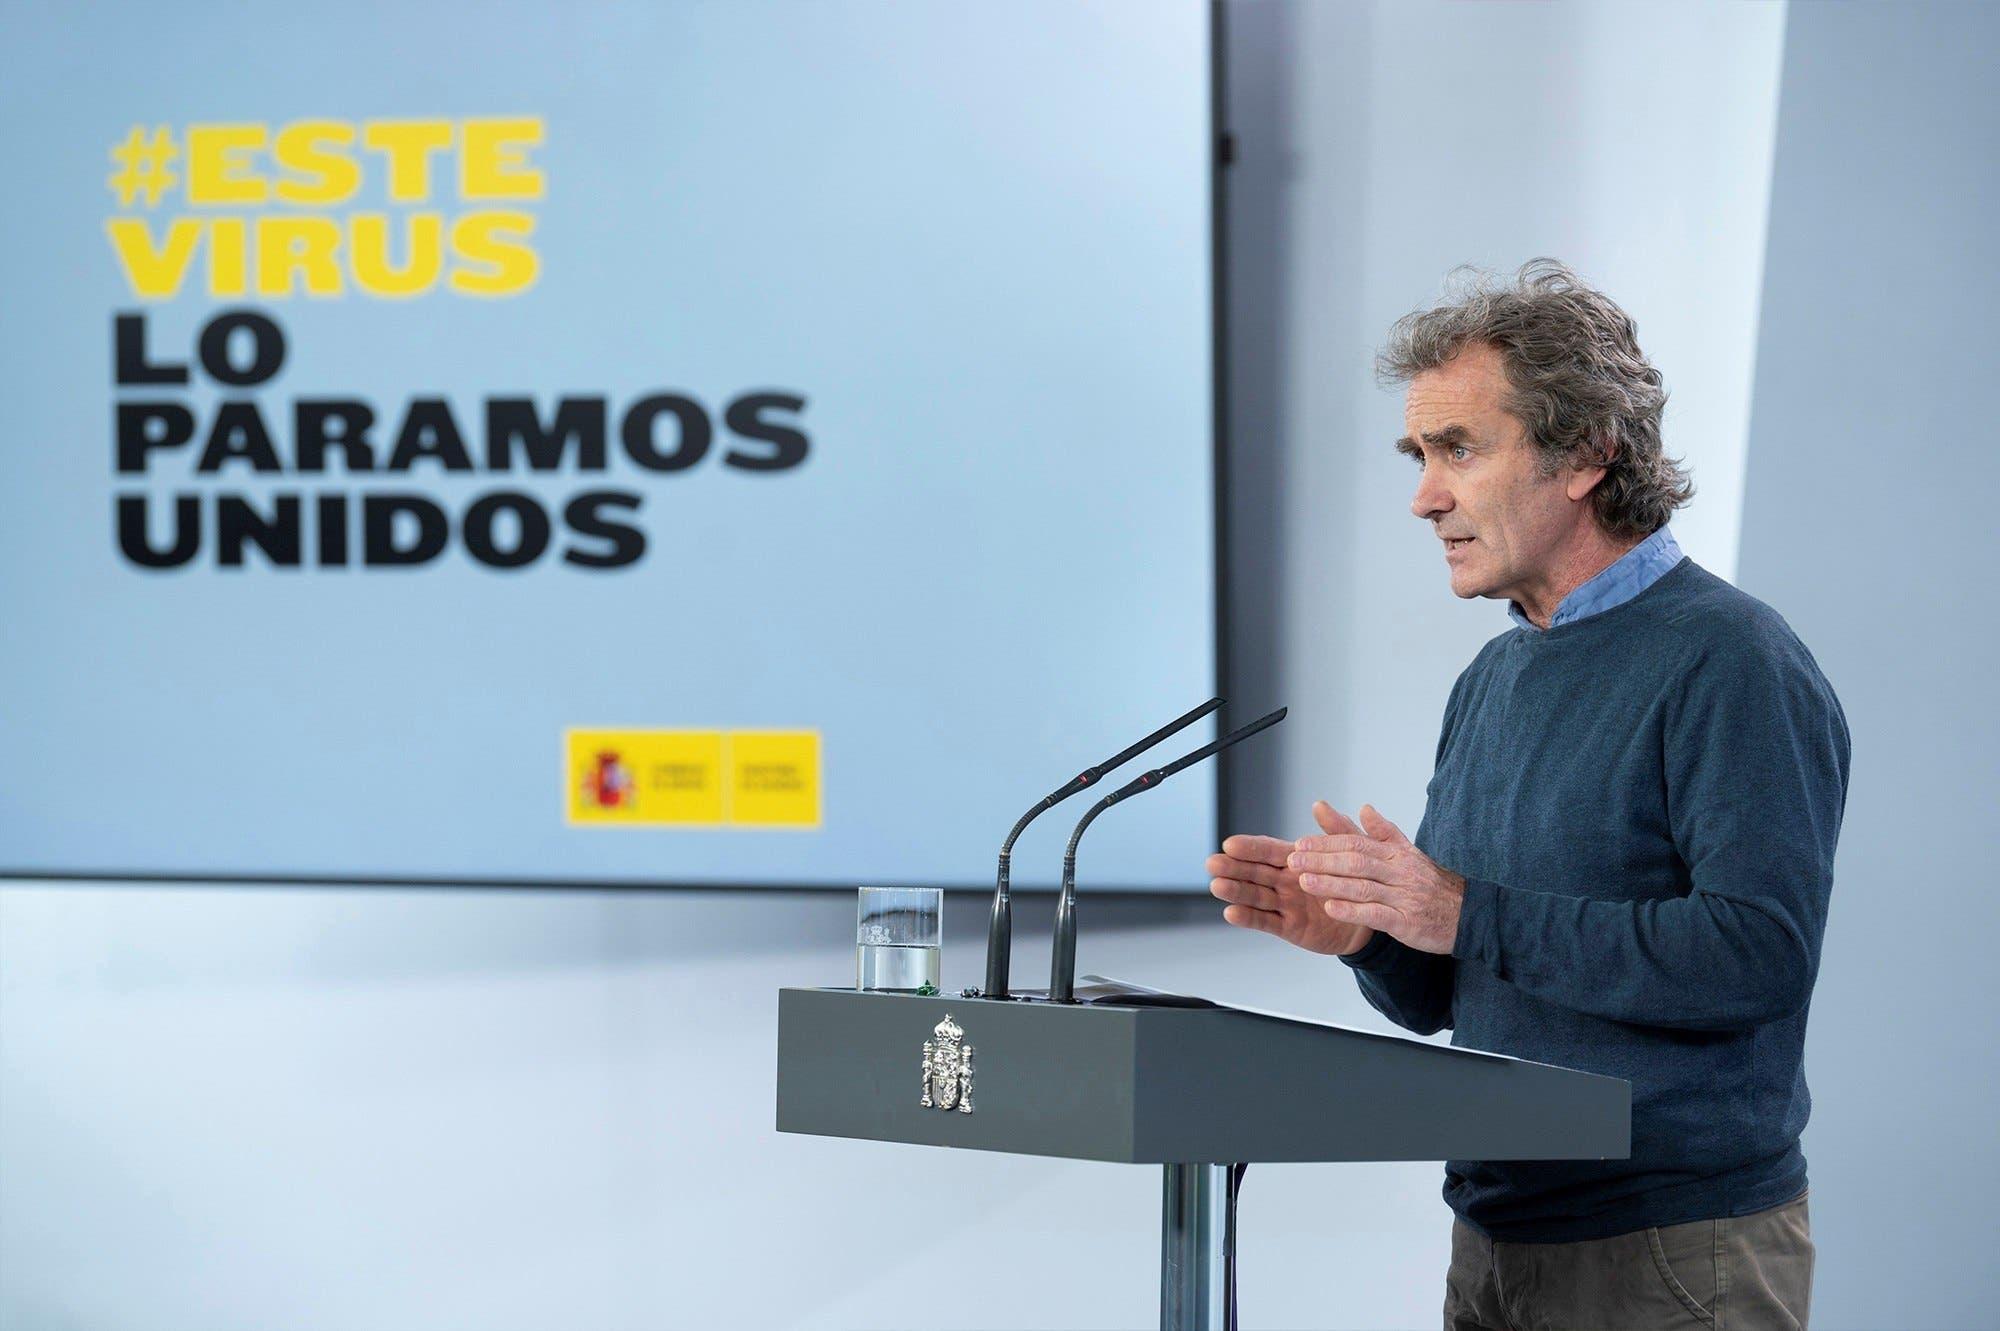 Hidroxicloroquina no es inocua, advierte director español de Emergencias